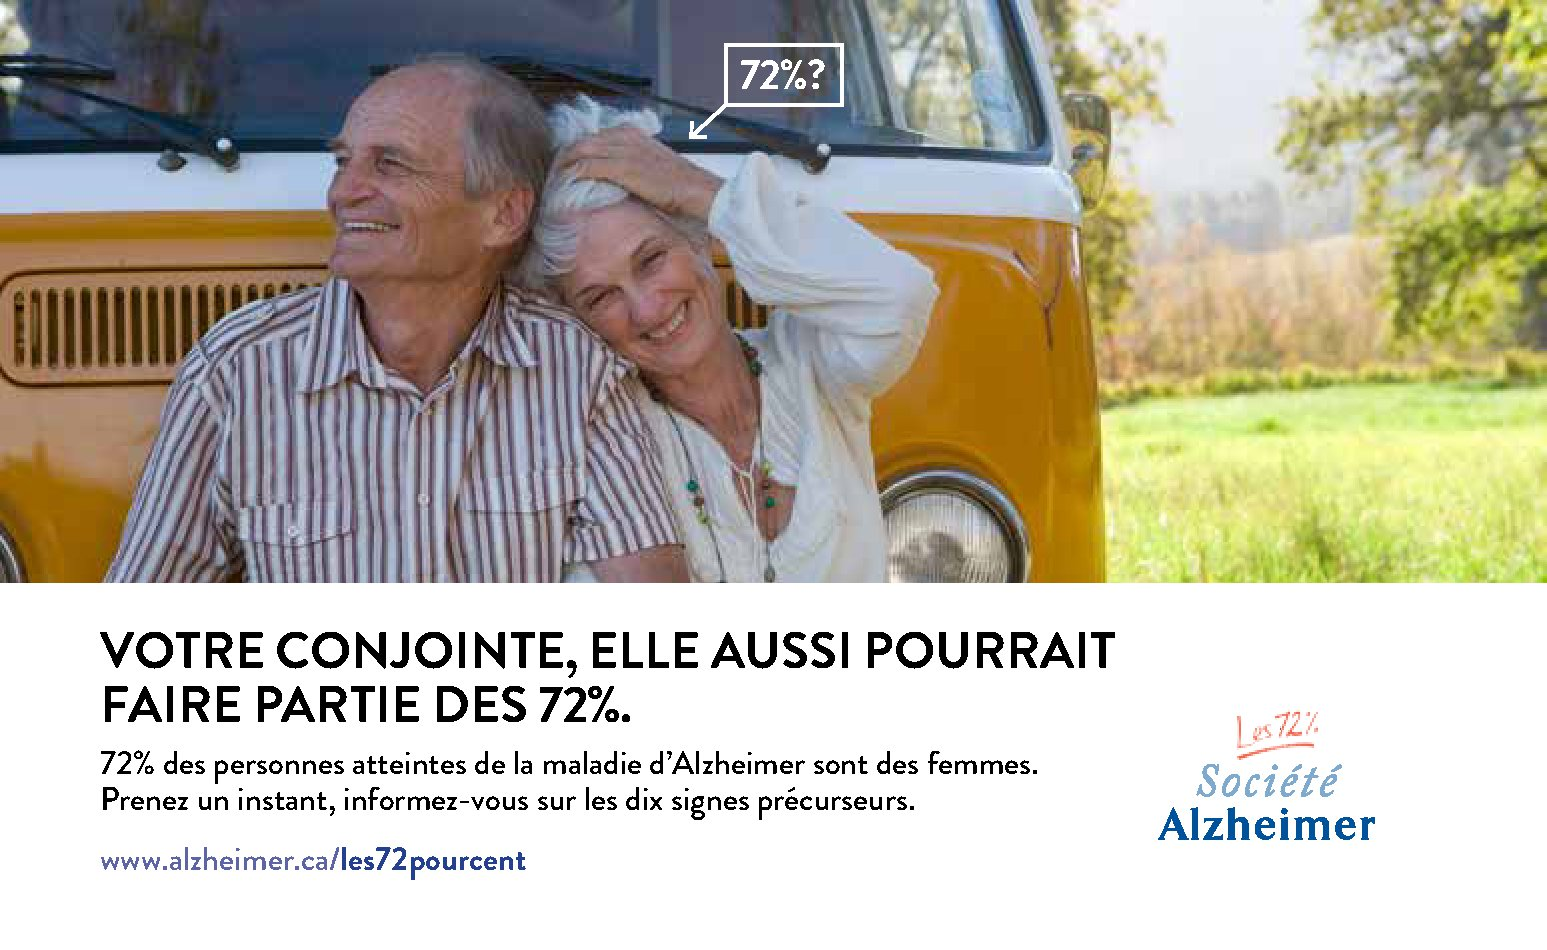 federation-quebecoise-des-societes-alzheimer